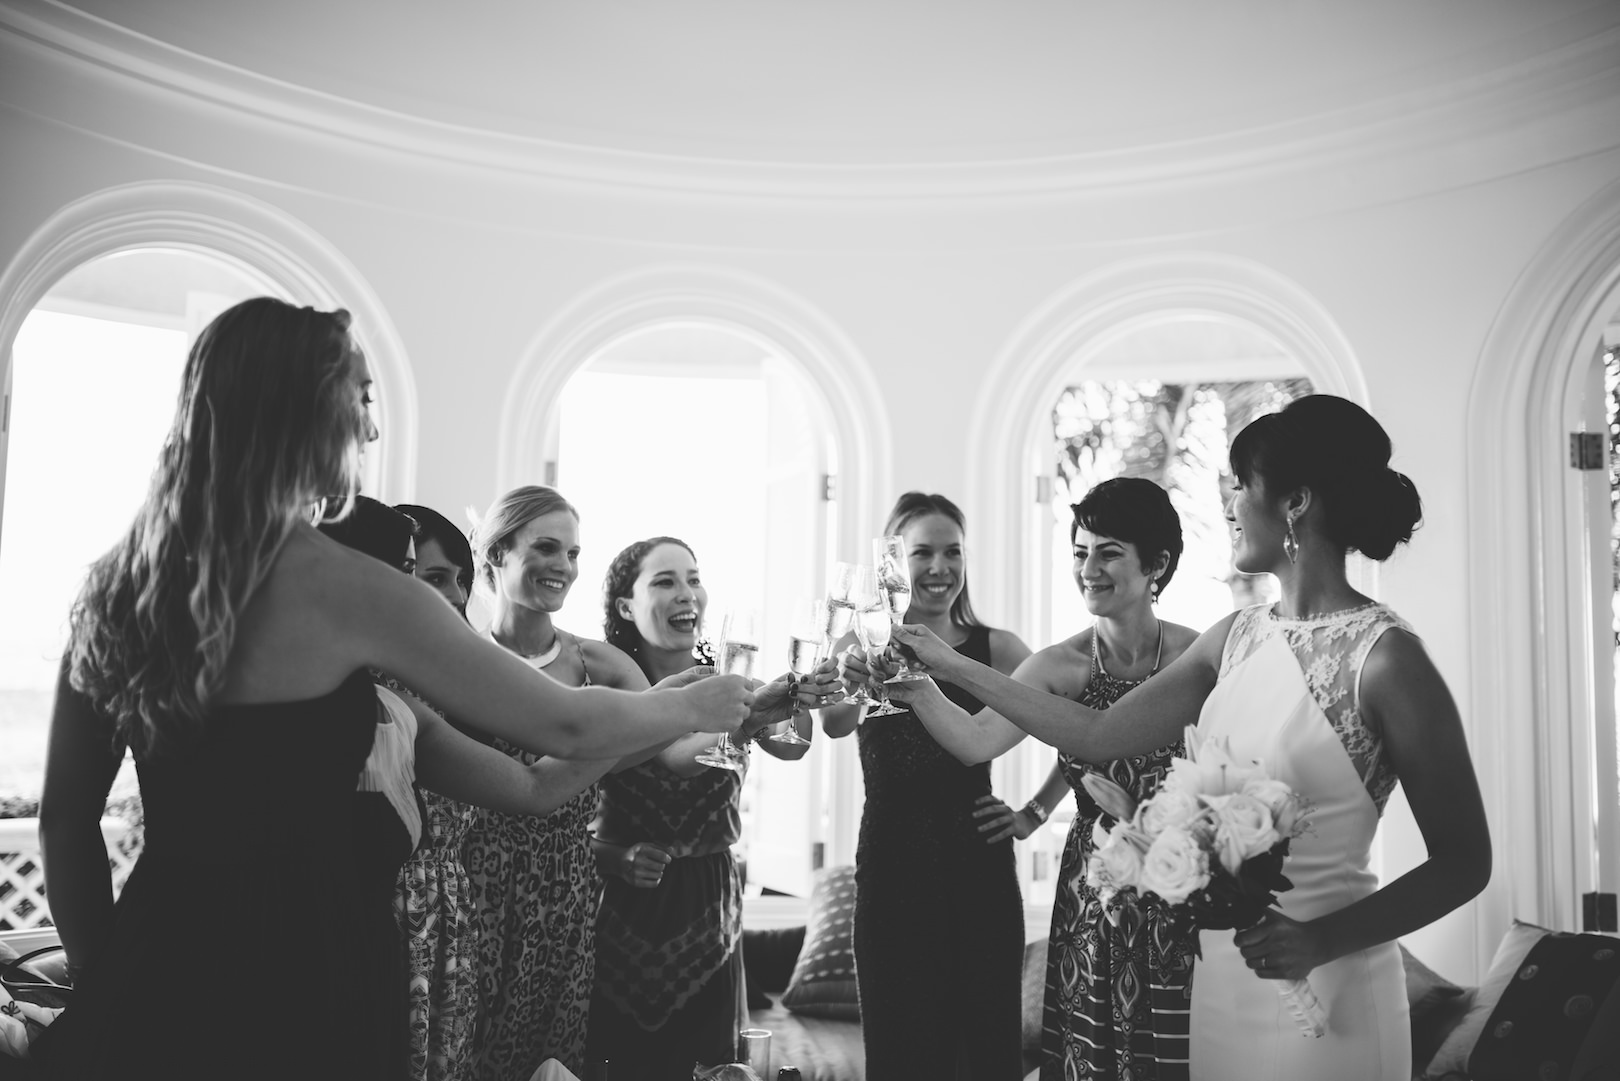 Nathan & Felicia - Wedding Day - © Dallas Kolotylo Photography - 197